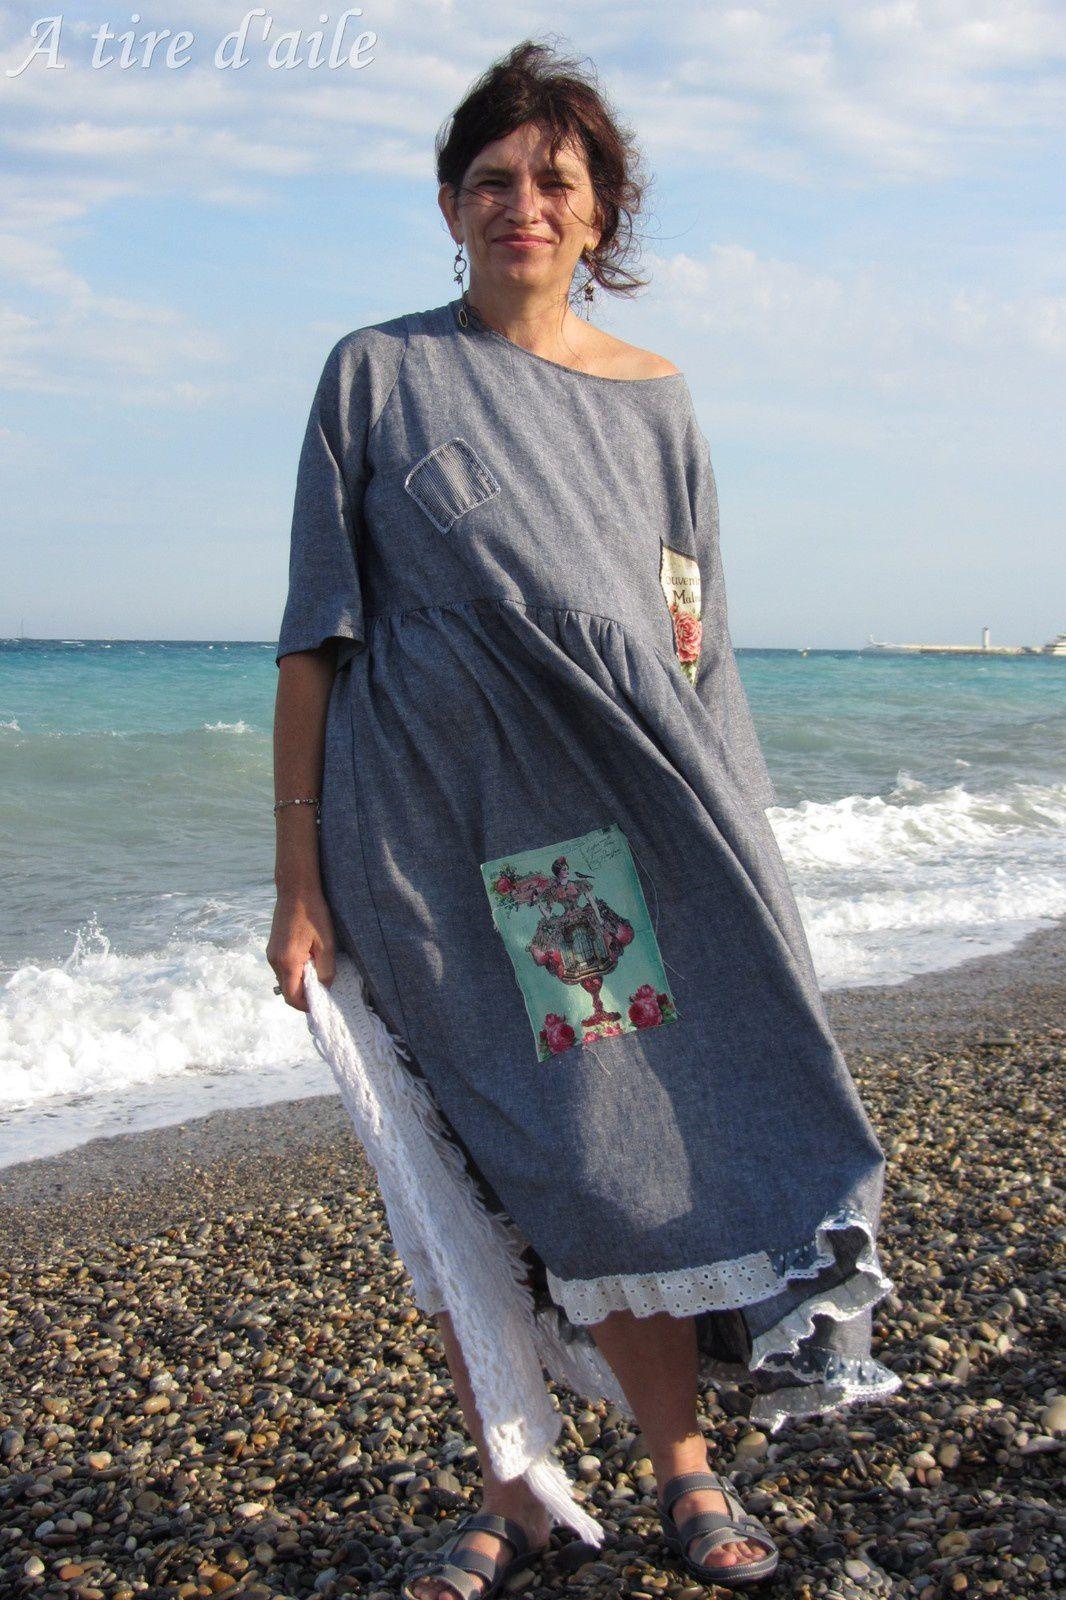 Robe customisée